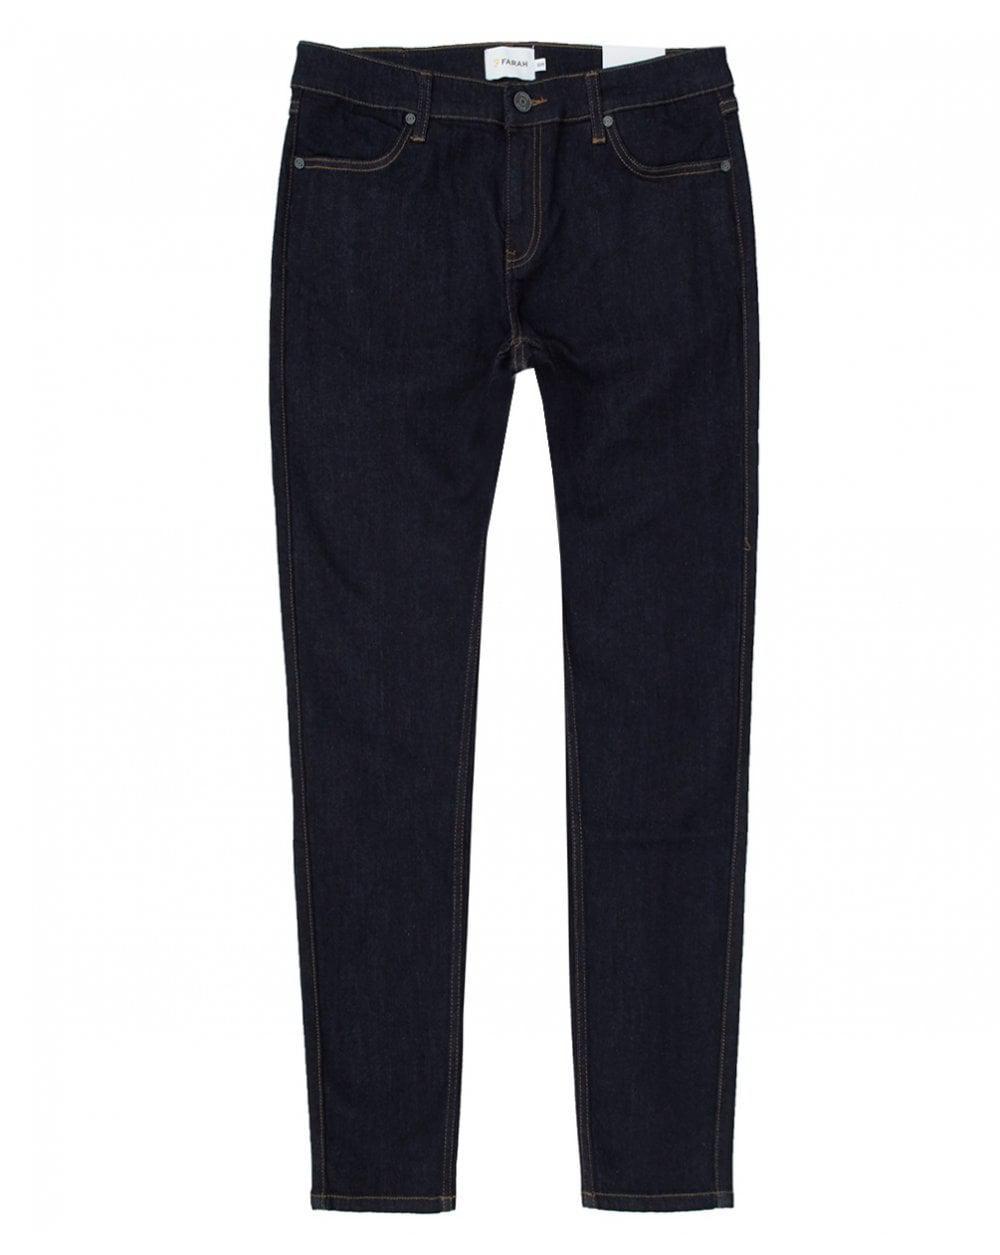 Lyst - Farah Howells Skinny Fit Jeans in Blue for Men 83b28b1d5a0d